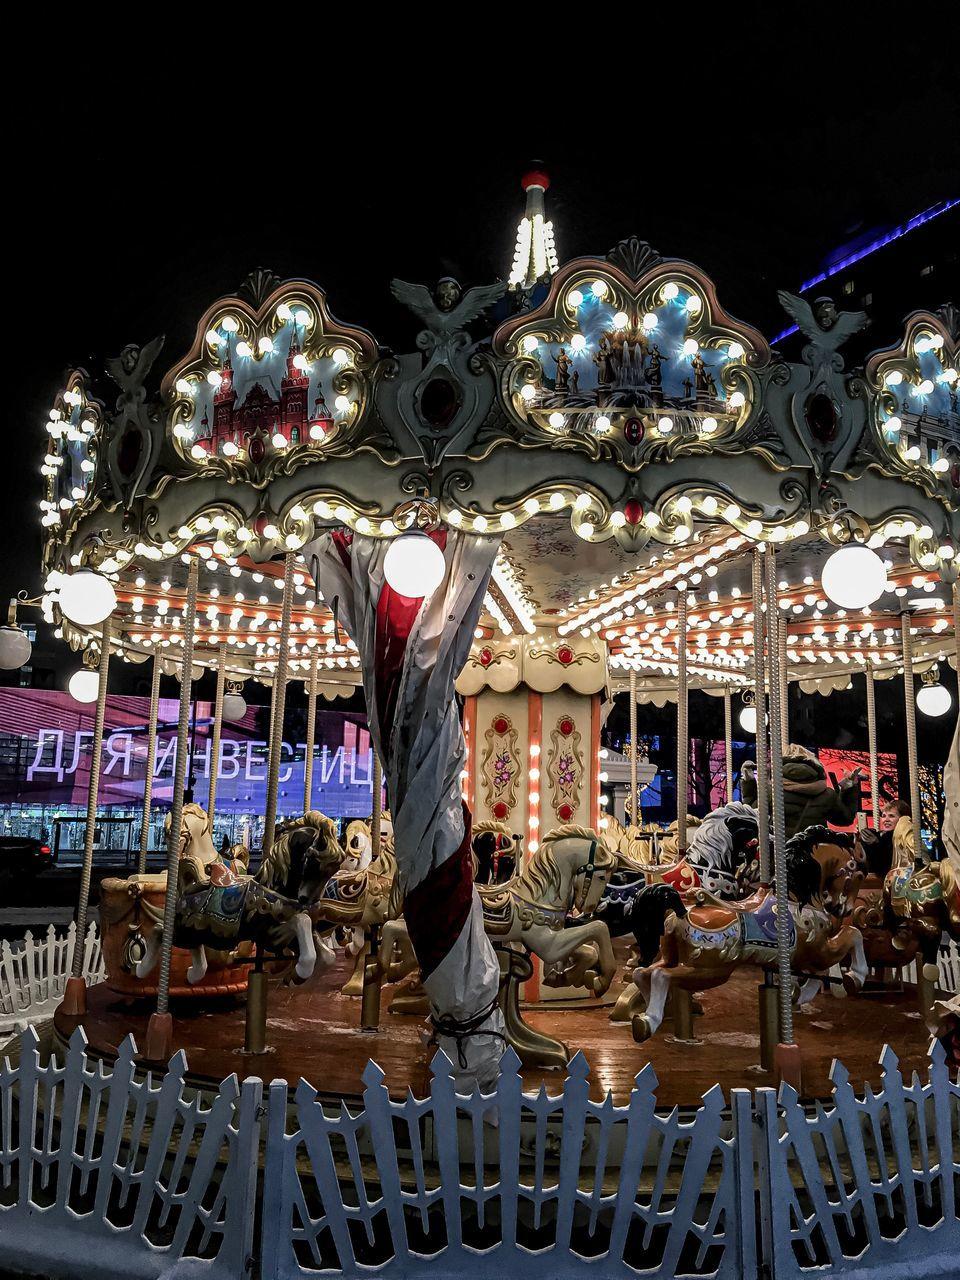 amusement park, amusement park ride, carousel, illuminated, night, representation, animal representation, arts culture and entertainment, leisure activity, carousel horses, mammal, art and craft, horse, animal, animal wildlife, built structure, livestock, enjoyment, group of people, domestic, outdoors, merry-go-round